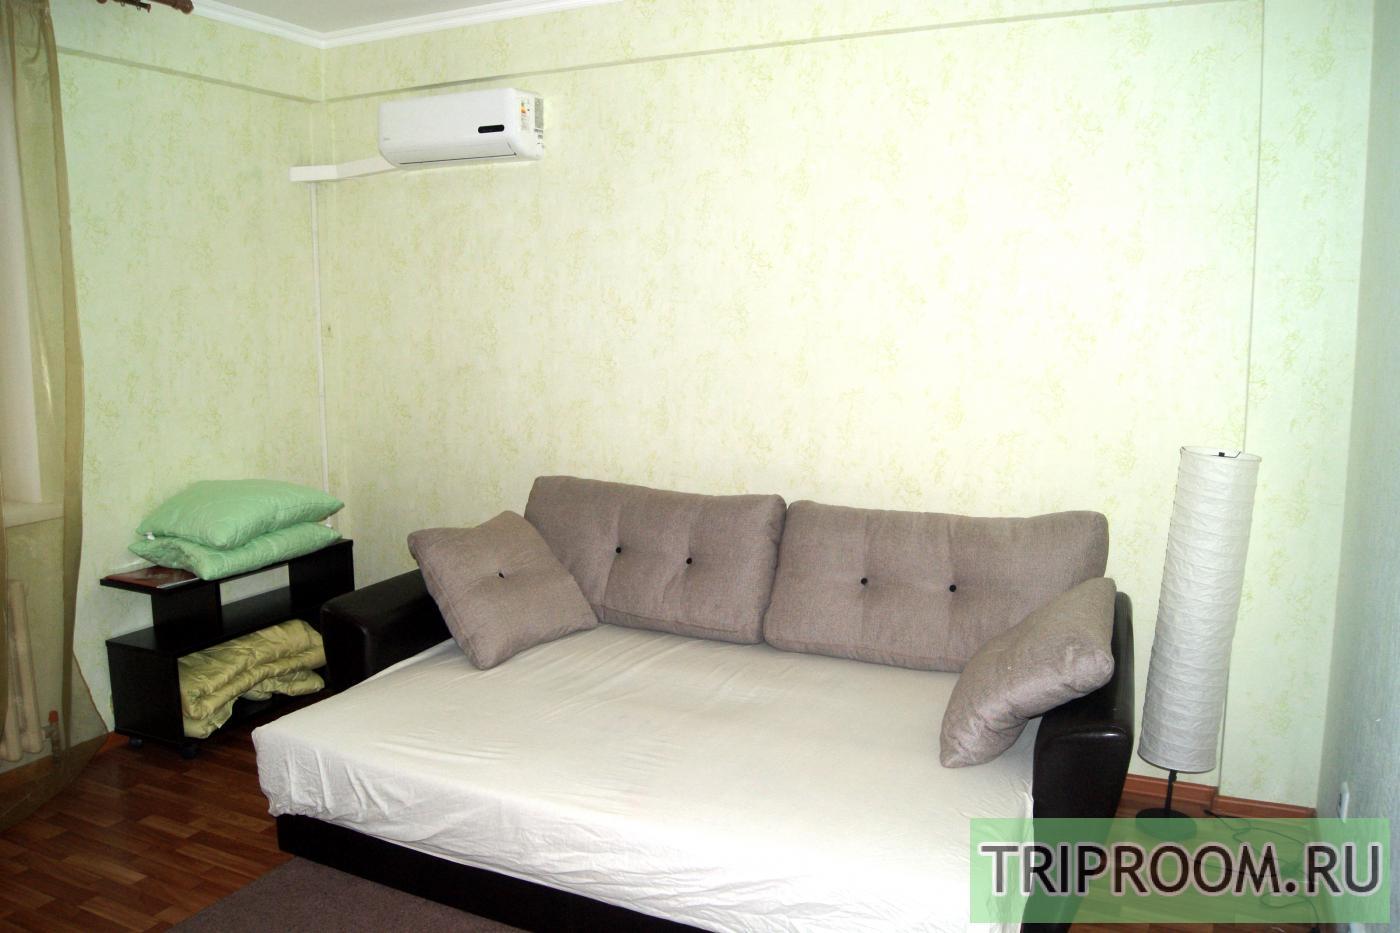 1-комнатная квартира посуточно (вариант № 16809), ул. п.смородина, фото № 2